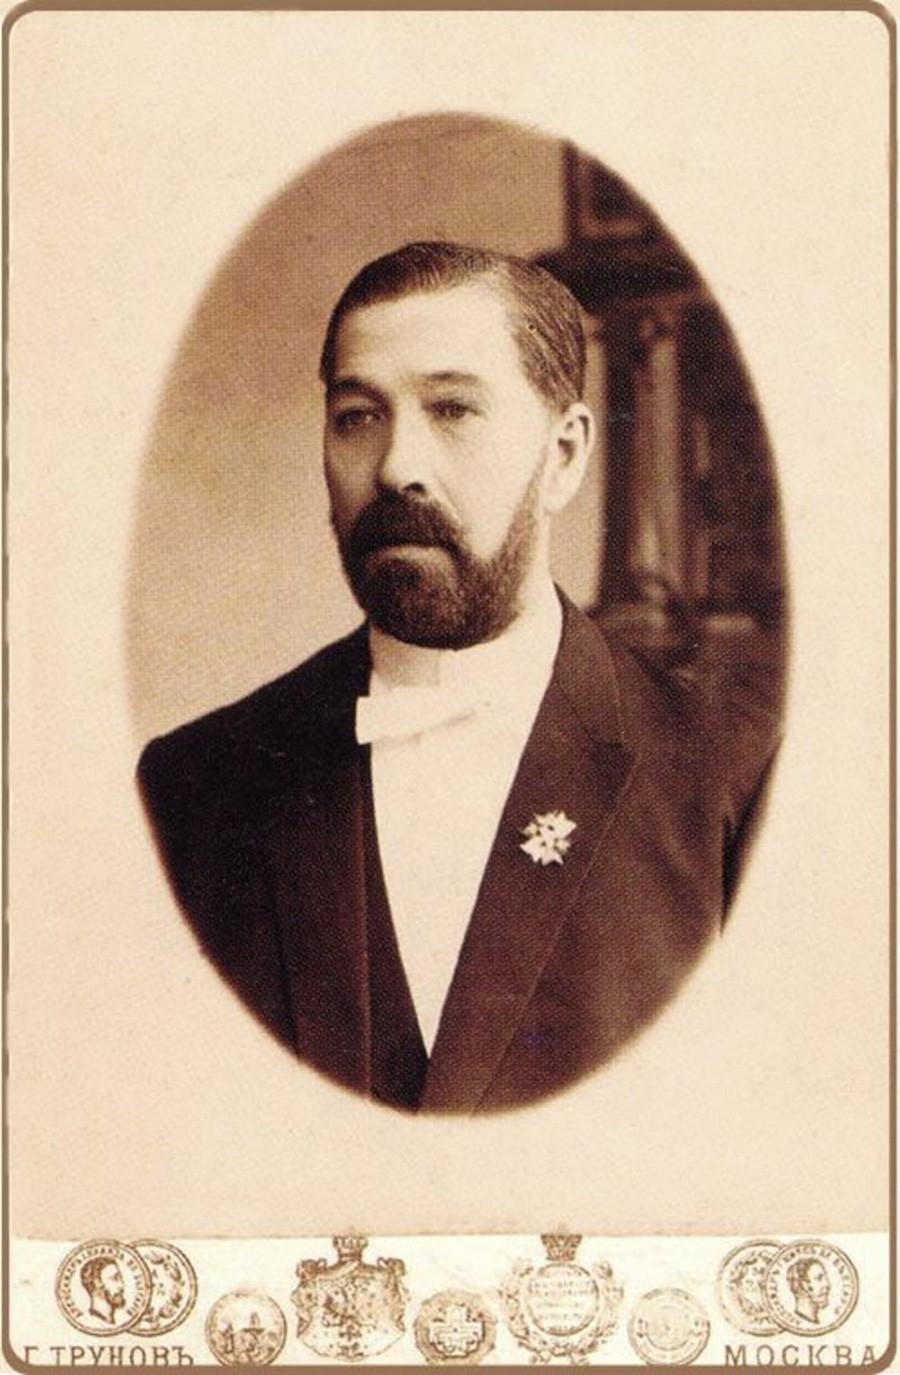 Pjotr Smirnov